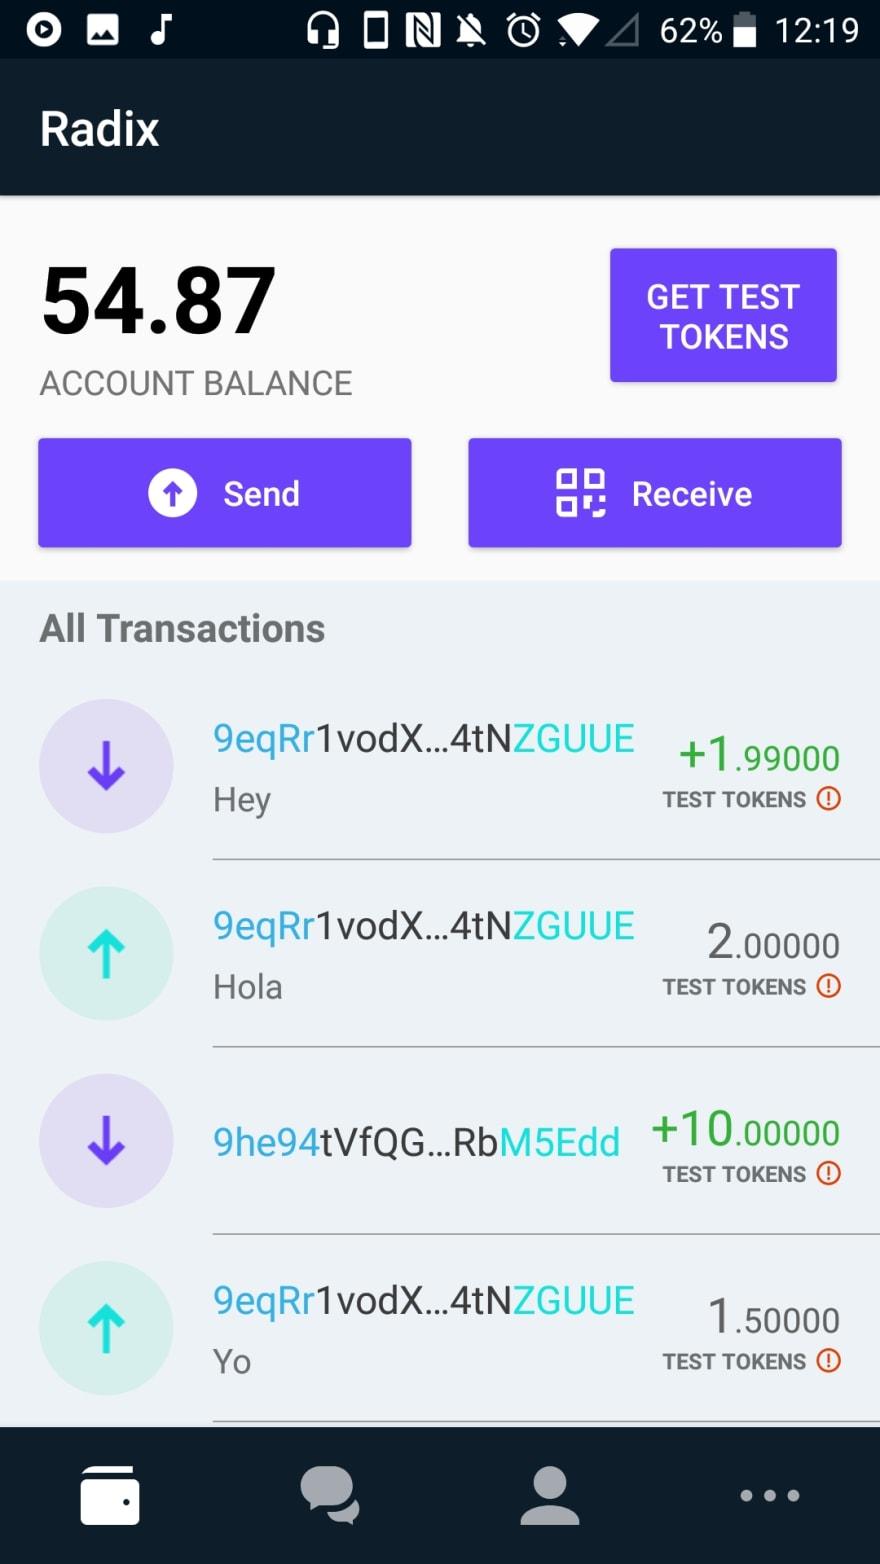 Radix DLT - Android wallet - DEV Community 👩 💻👨 💻